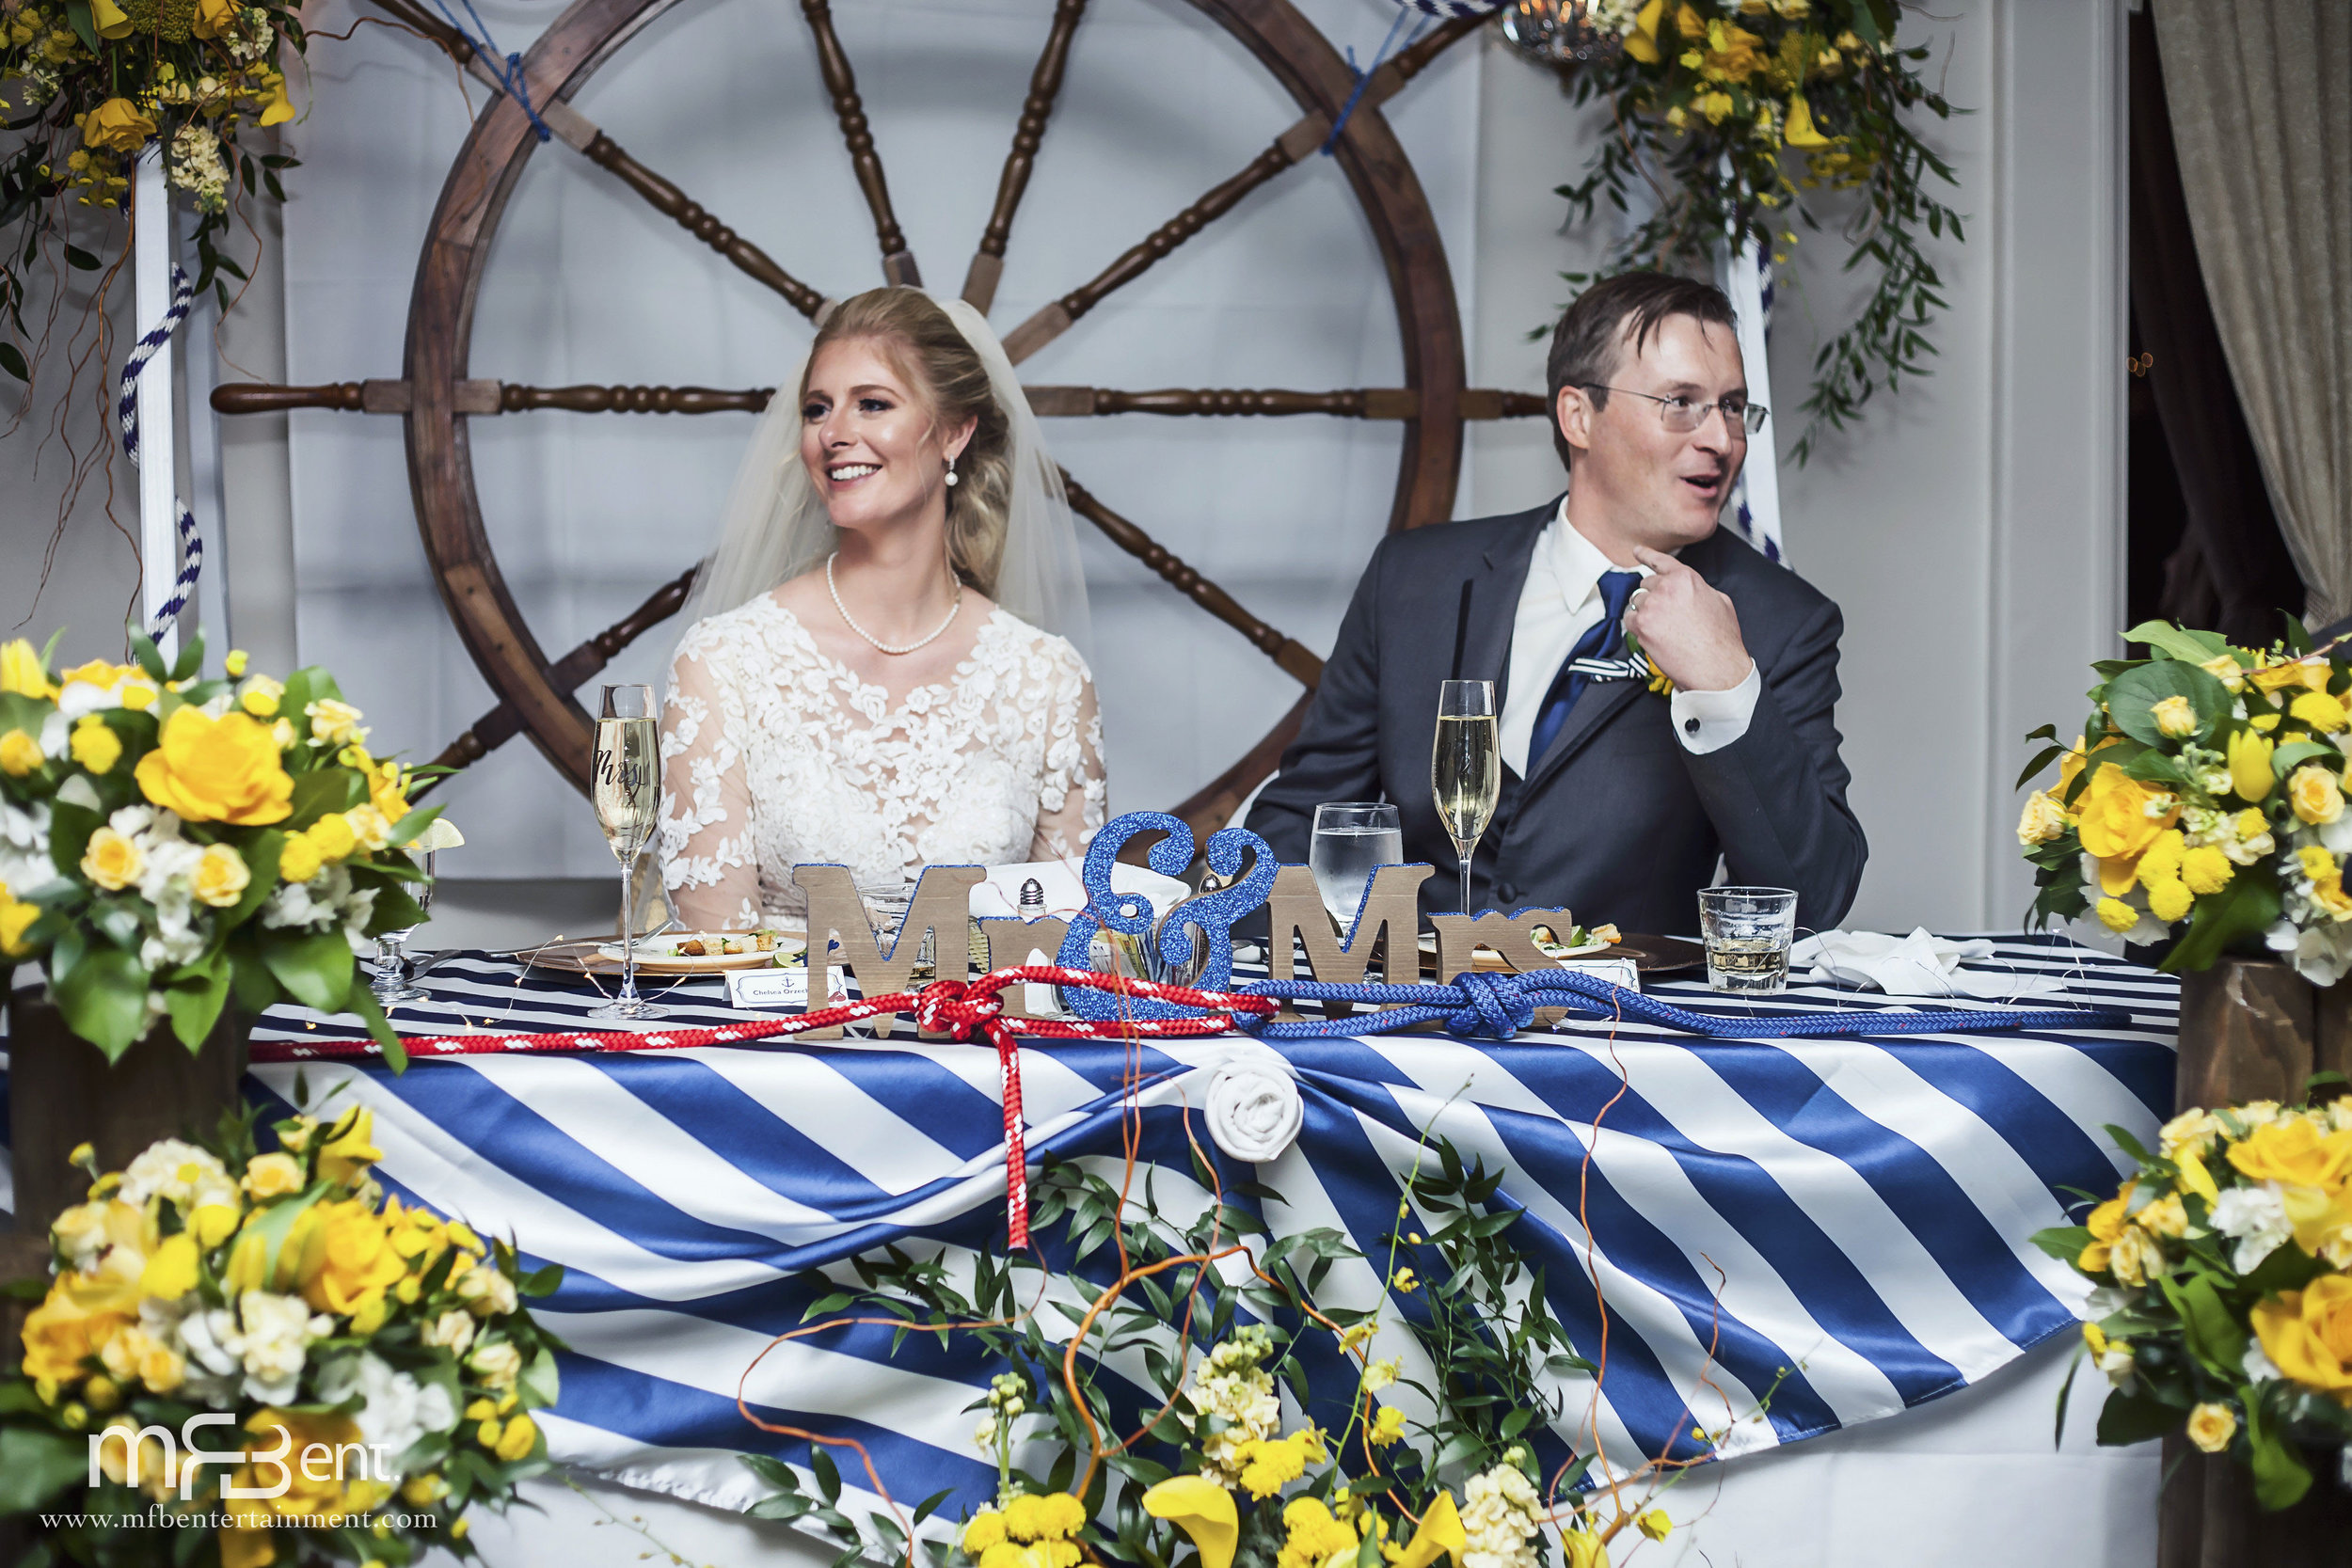 PIOTR CHELSEA WEDDING-RECEPTION-0073 L.jpg